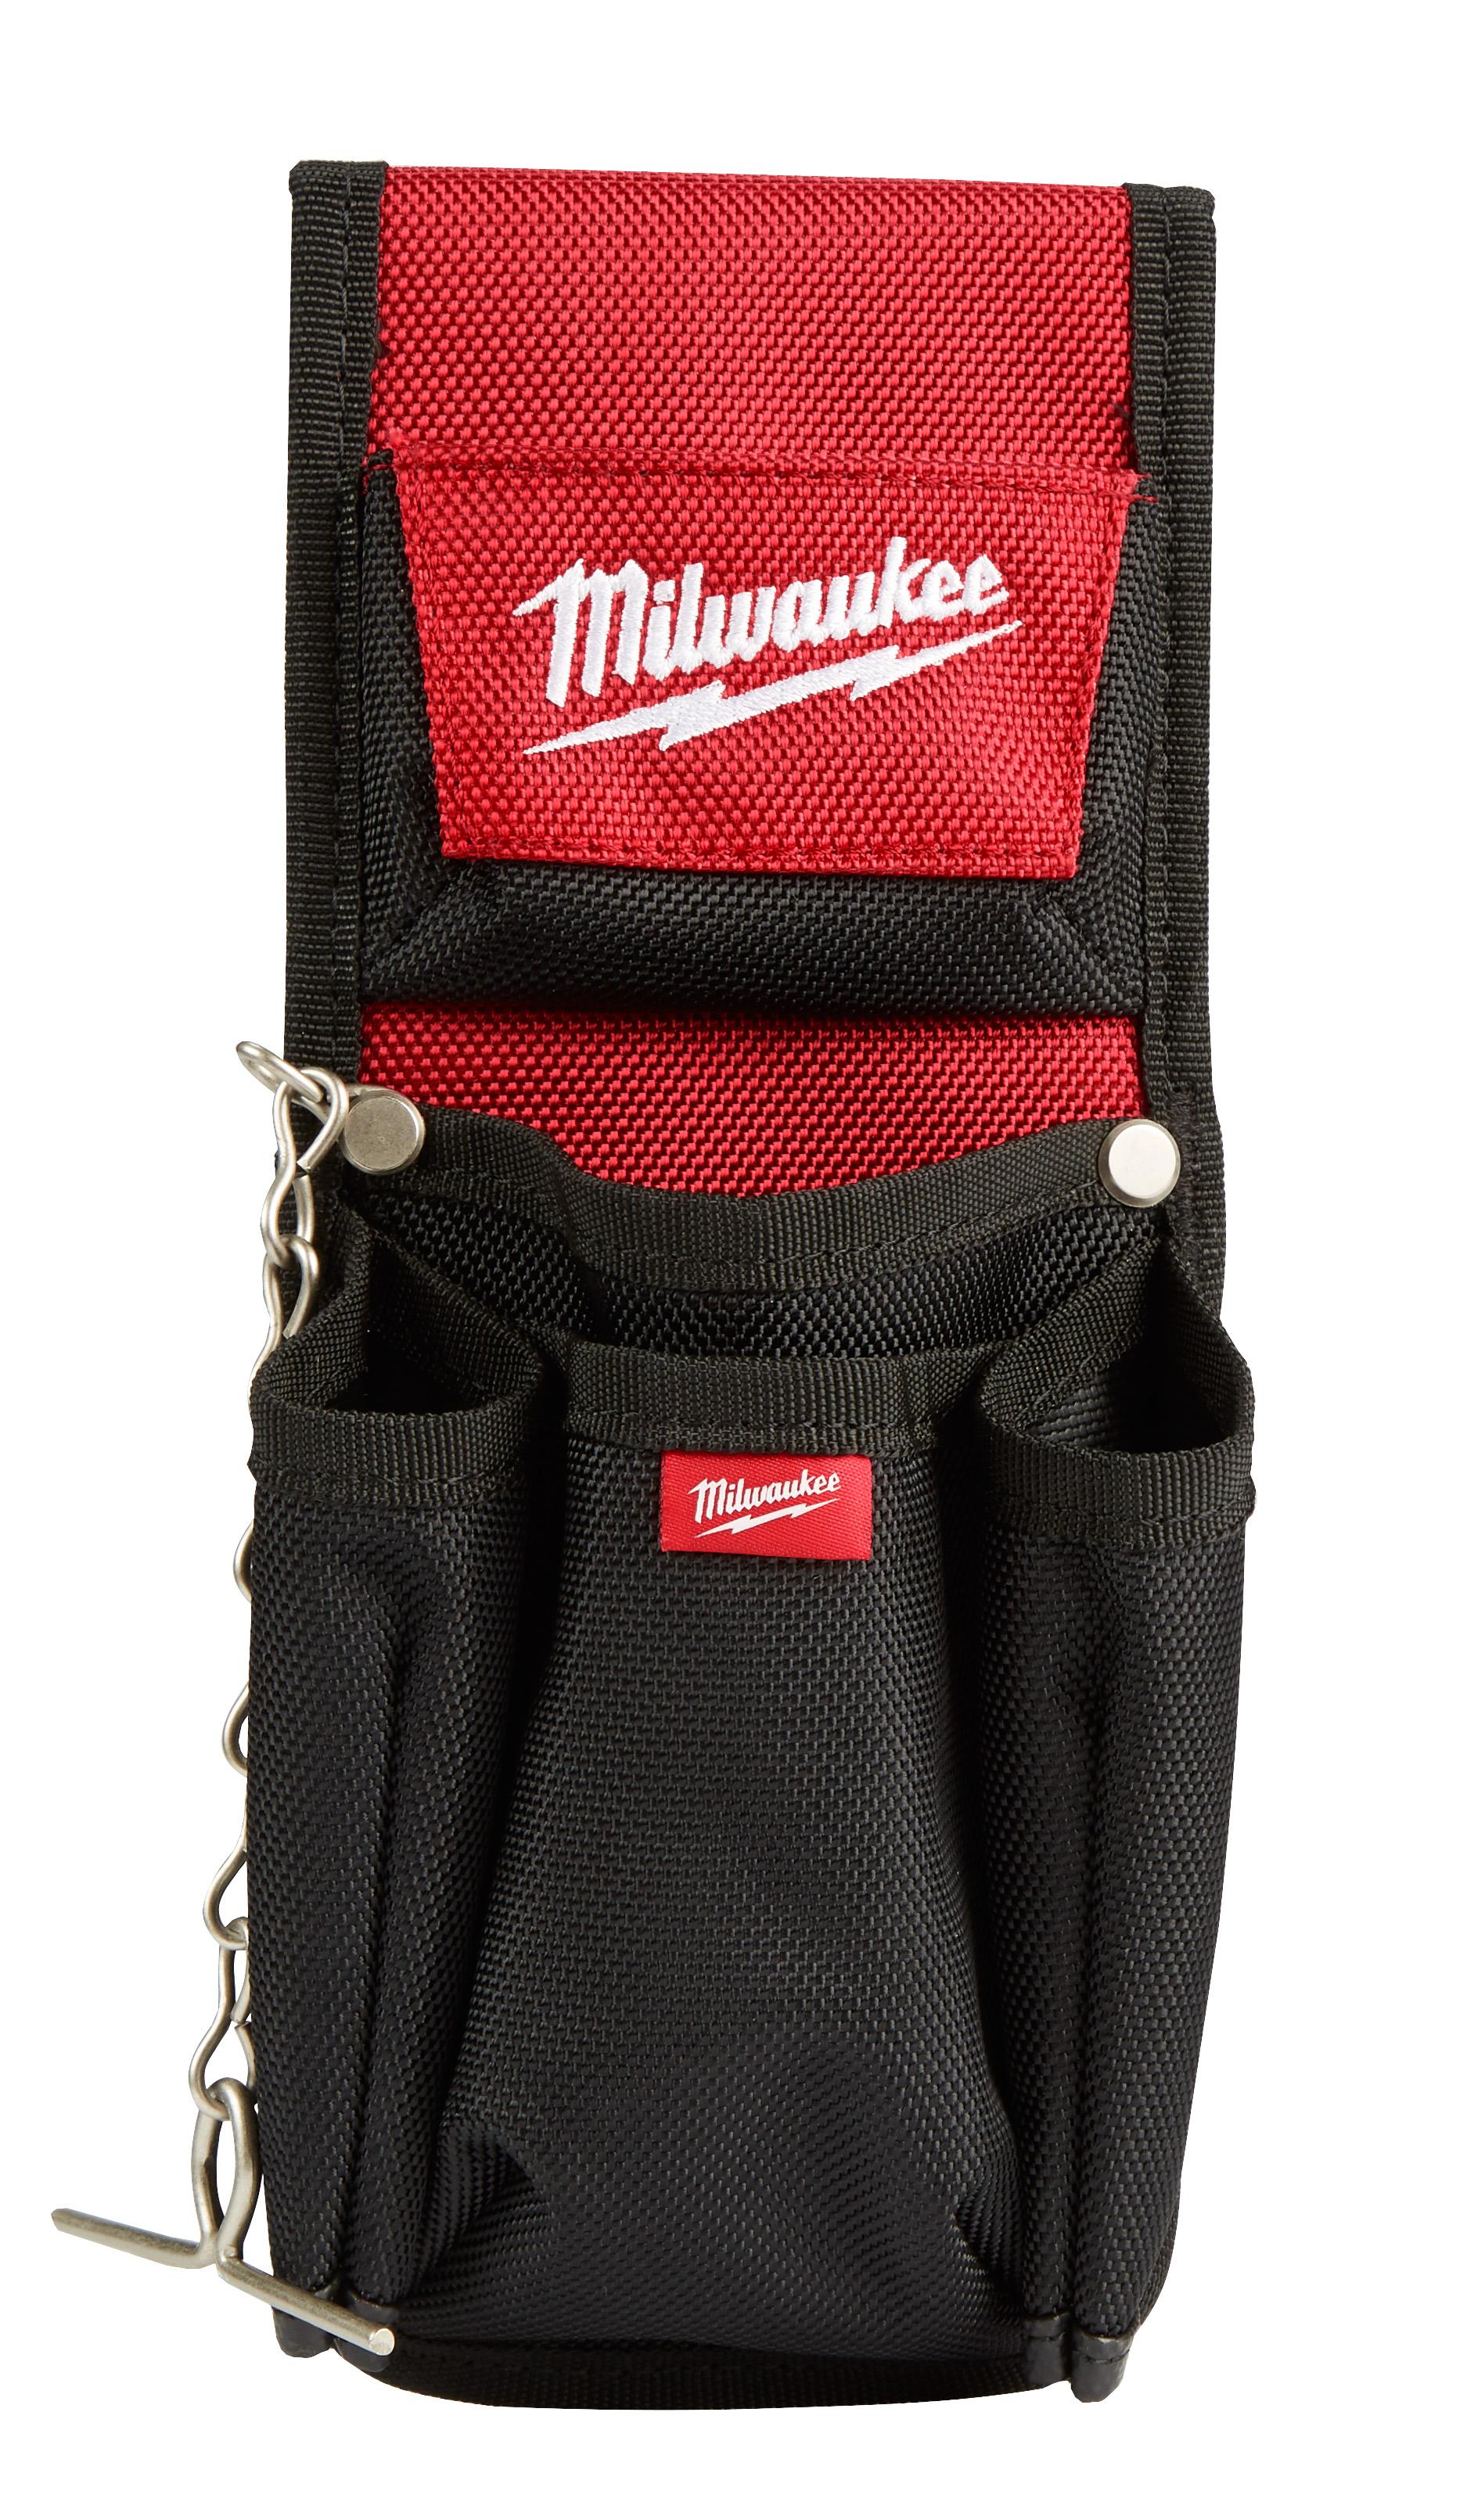 Milwaukee® 48-22-8118 7-Pocket Compact Utility Pouch, 1680D Ballistic Nylon, Black/Red